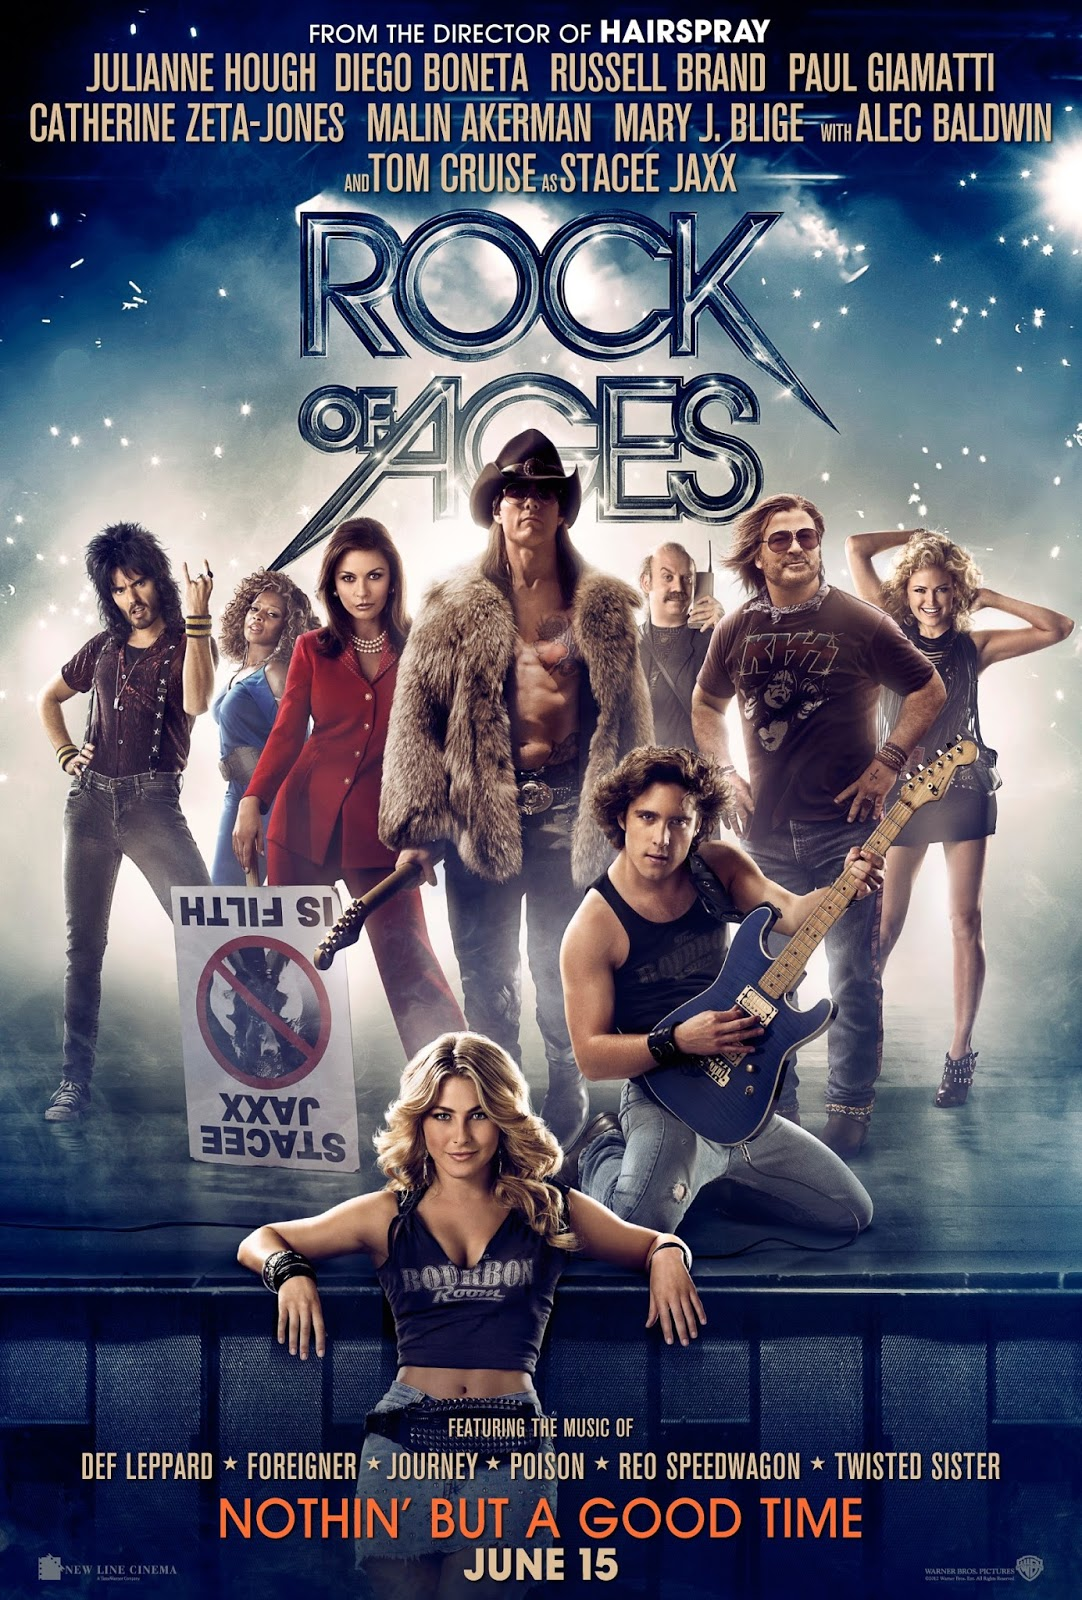 Rock of Ages ร็อคเขย่ายุค รักเขย่าโลก [HD][พากย์ไทย]